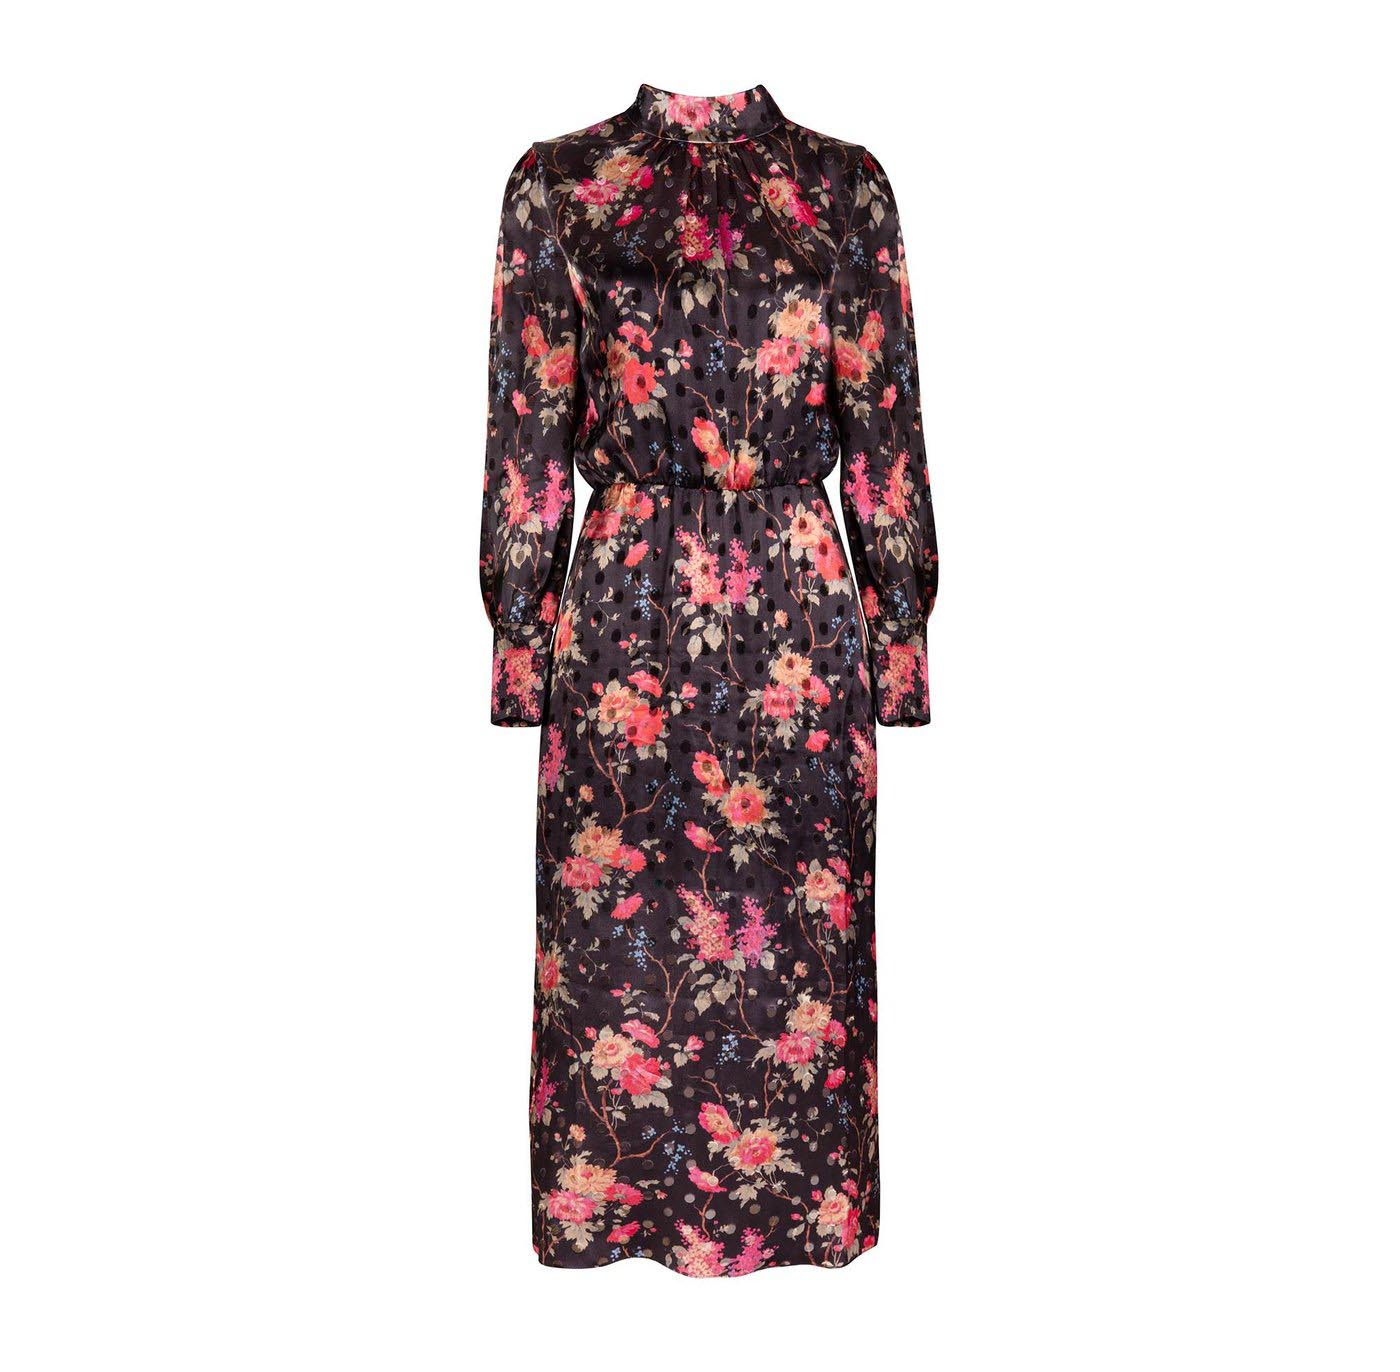 Dress_5_1400x